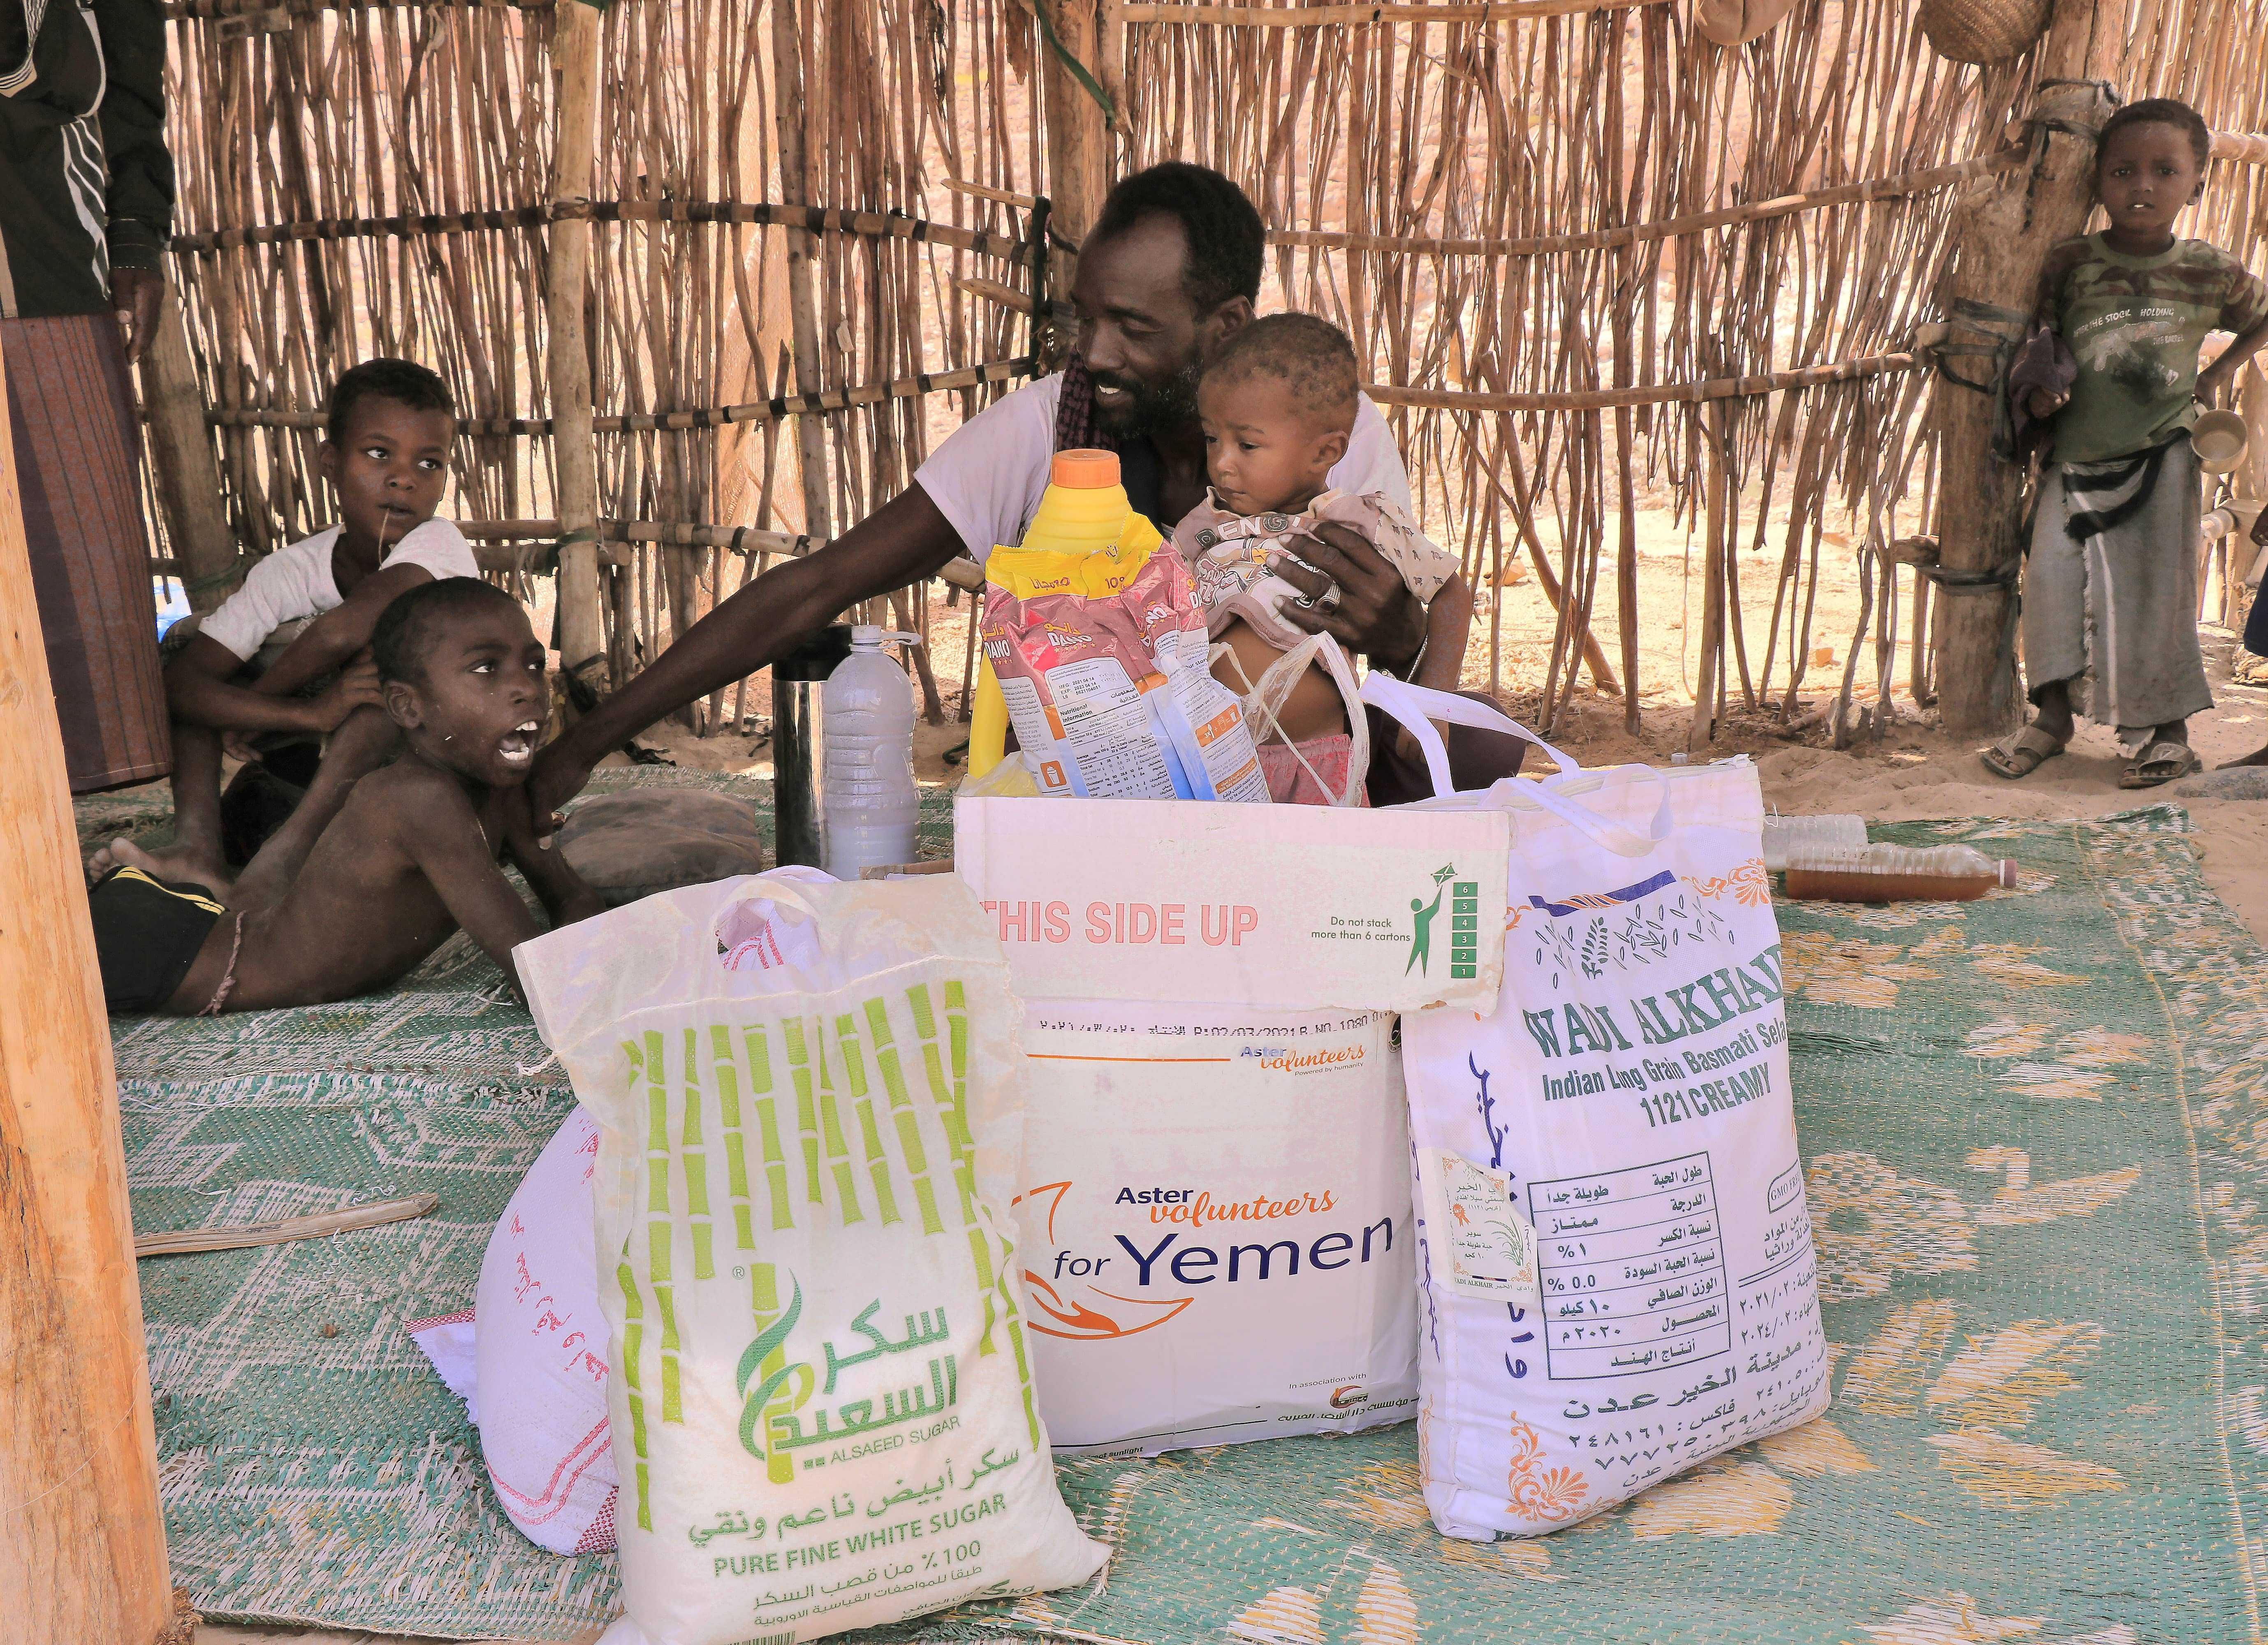 Aster Volunteers donates ration kit weighing 50 kg each to 1500 underprivileged families in Yemen